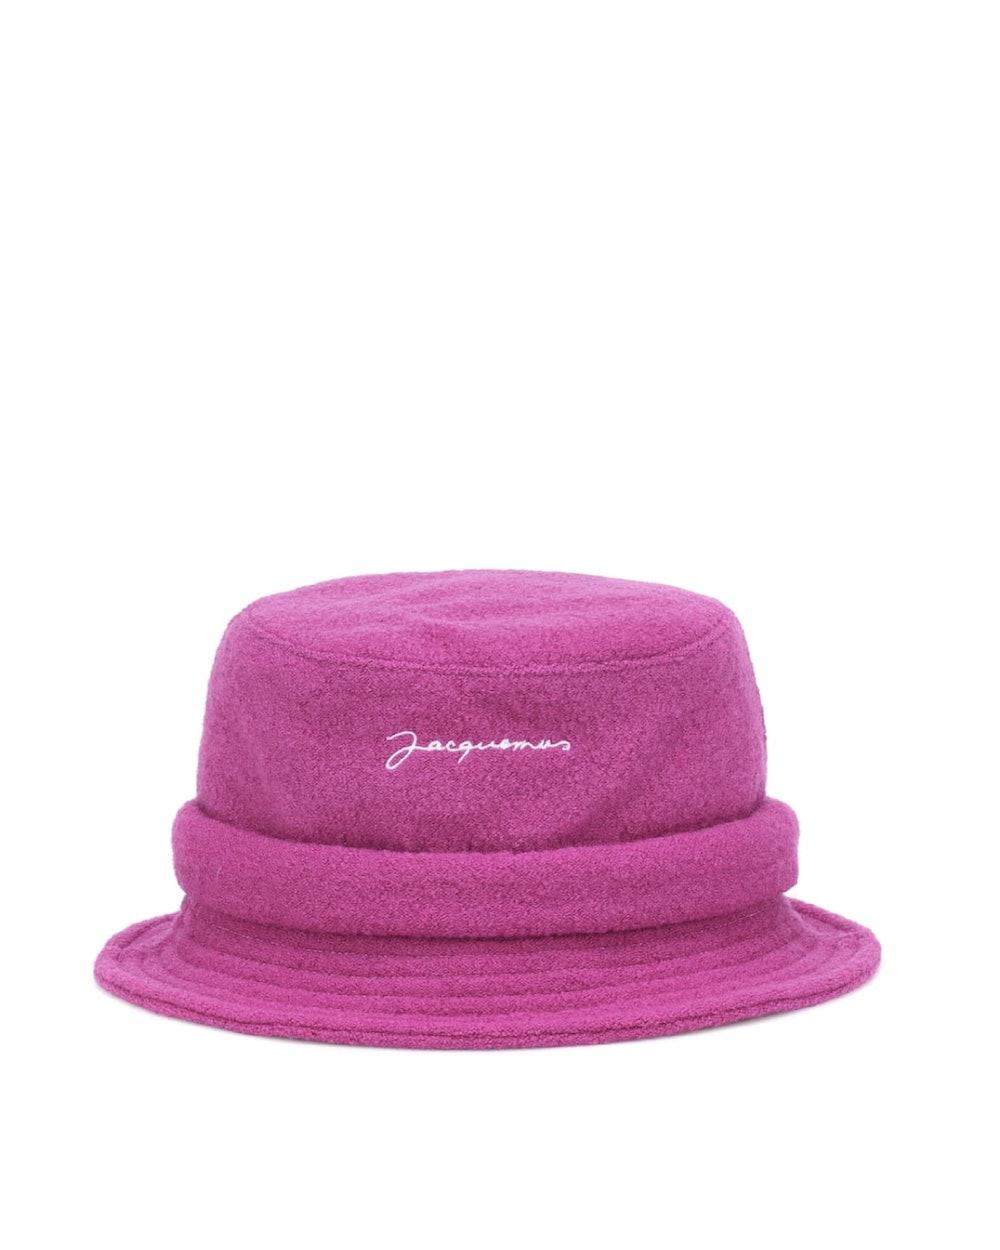 Le Bob Jacquemus Wool Bucket Hat